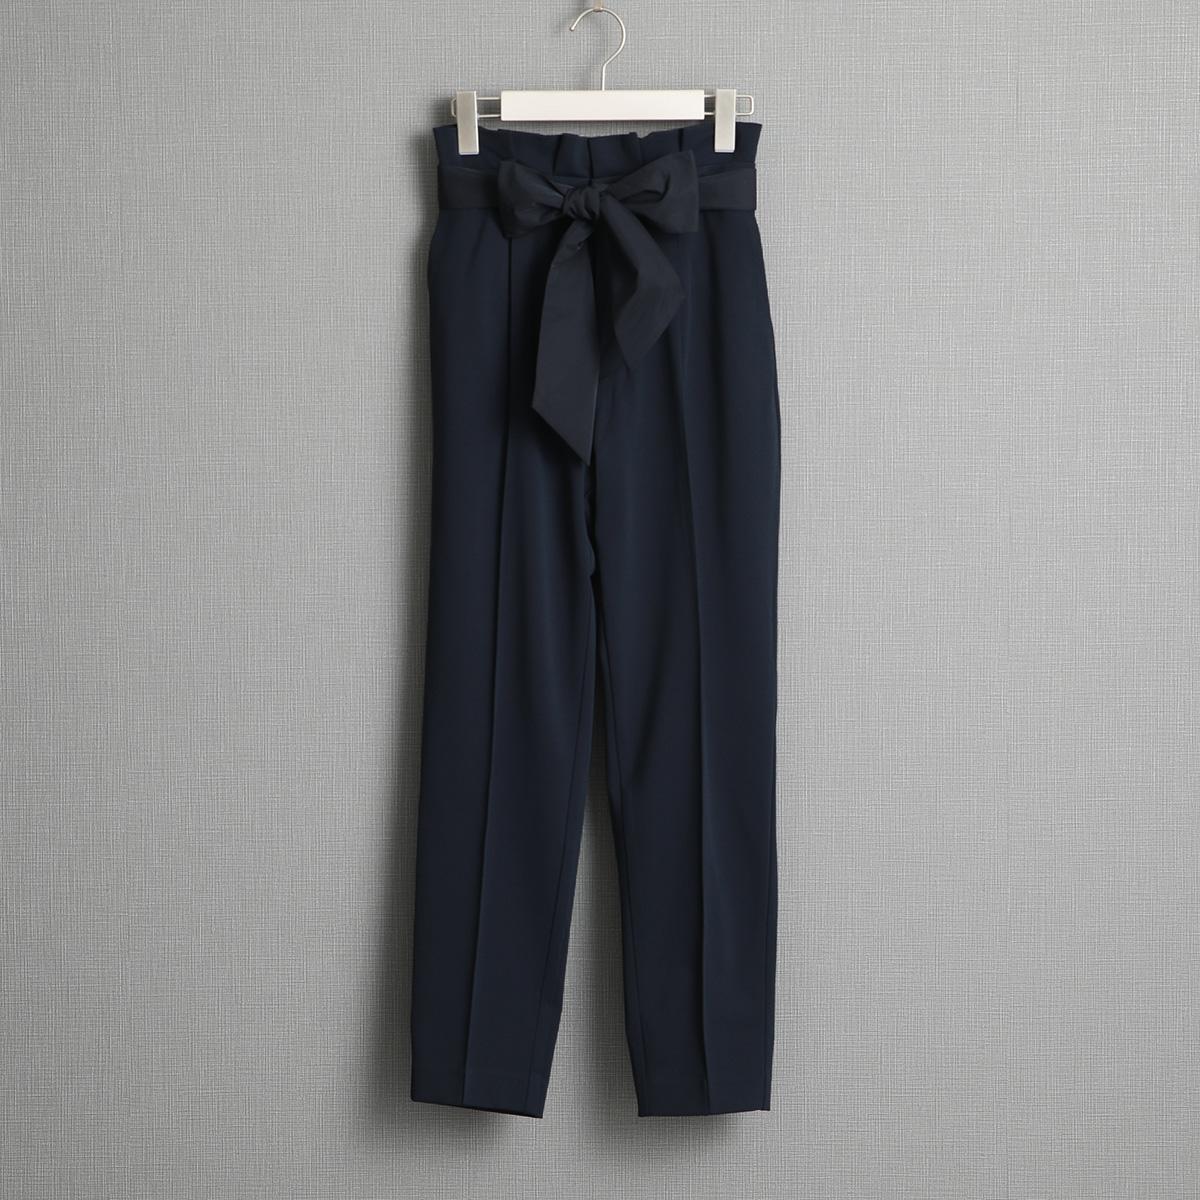 『Dress knit』 tapered Pants BLACK画像